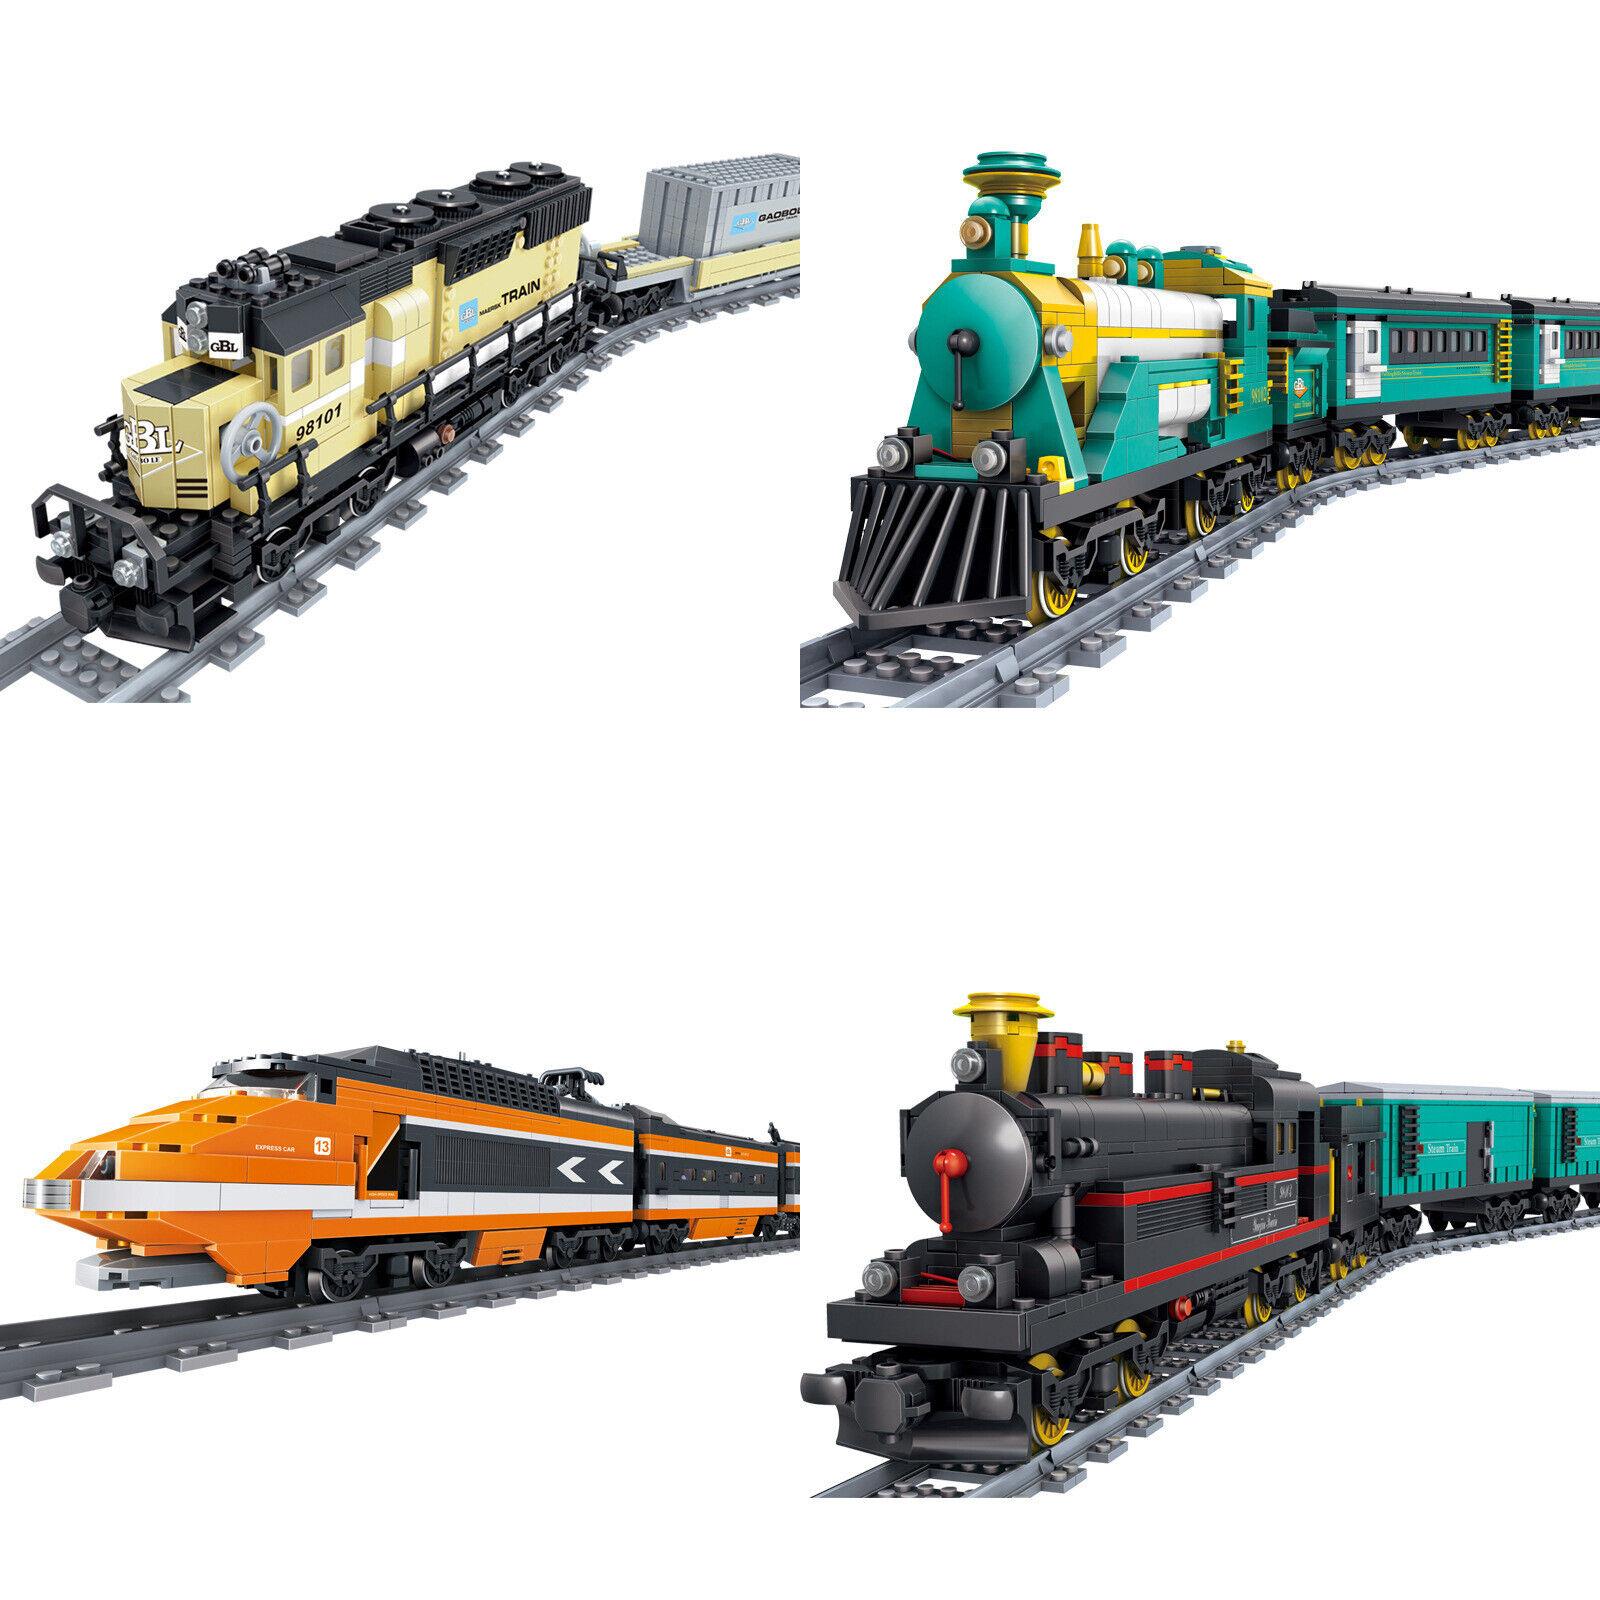 Large Battery Operated Train Railway Track Building Bricks Construction Blocks